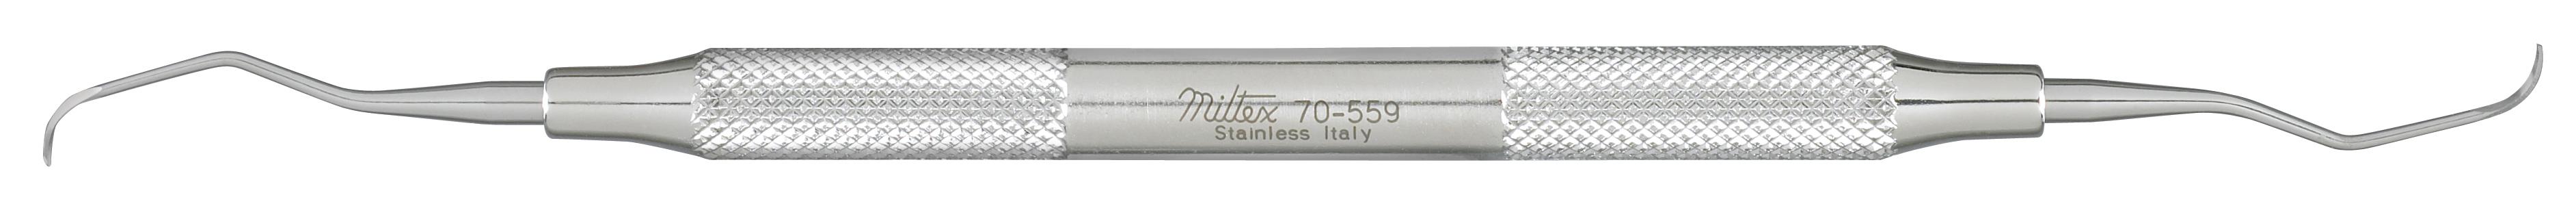 langer-5-6-curette-lightweight-handle-70-559-miltex.jpg